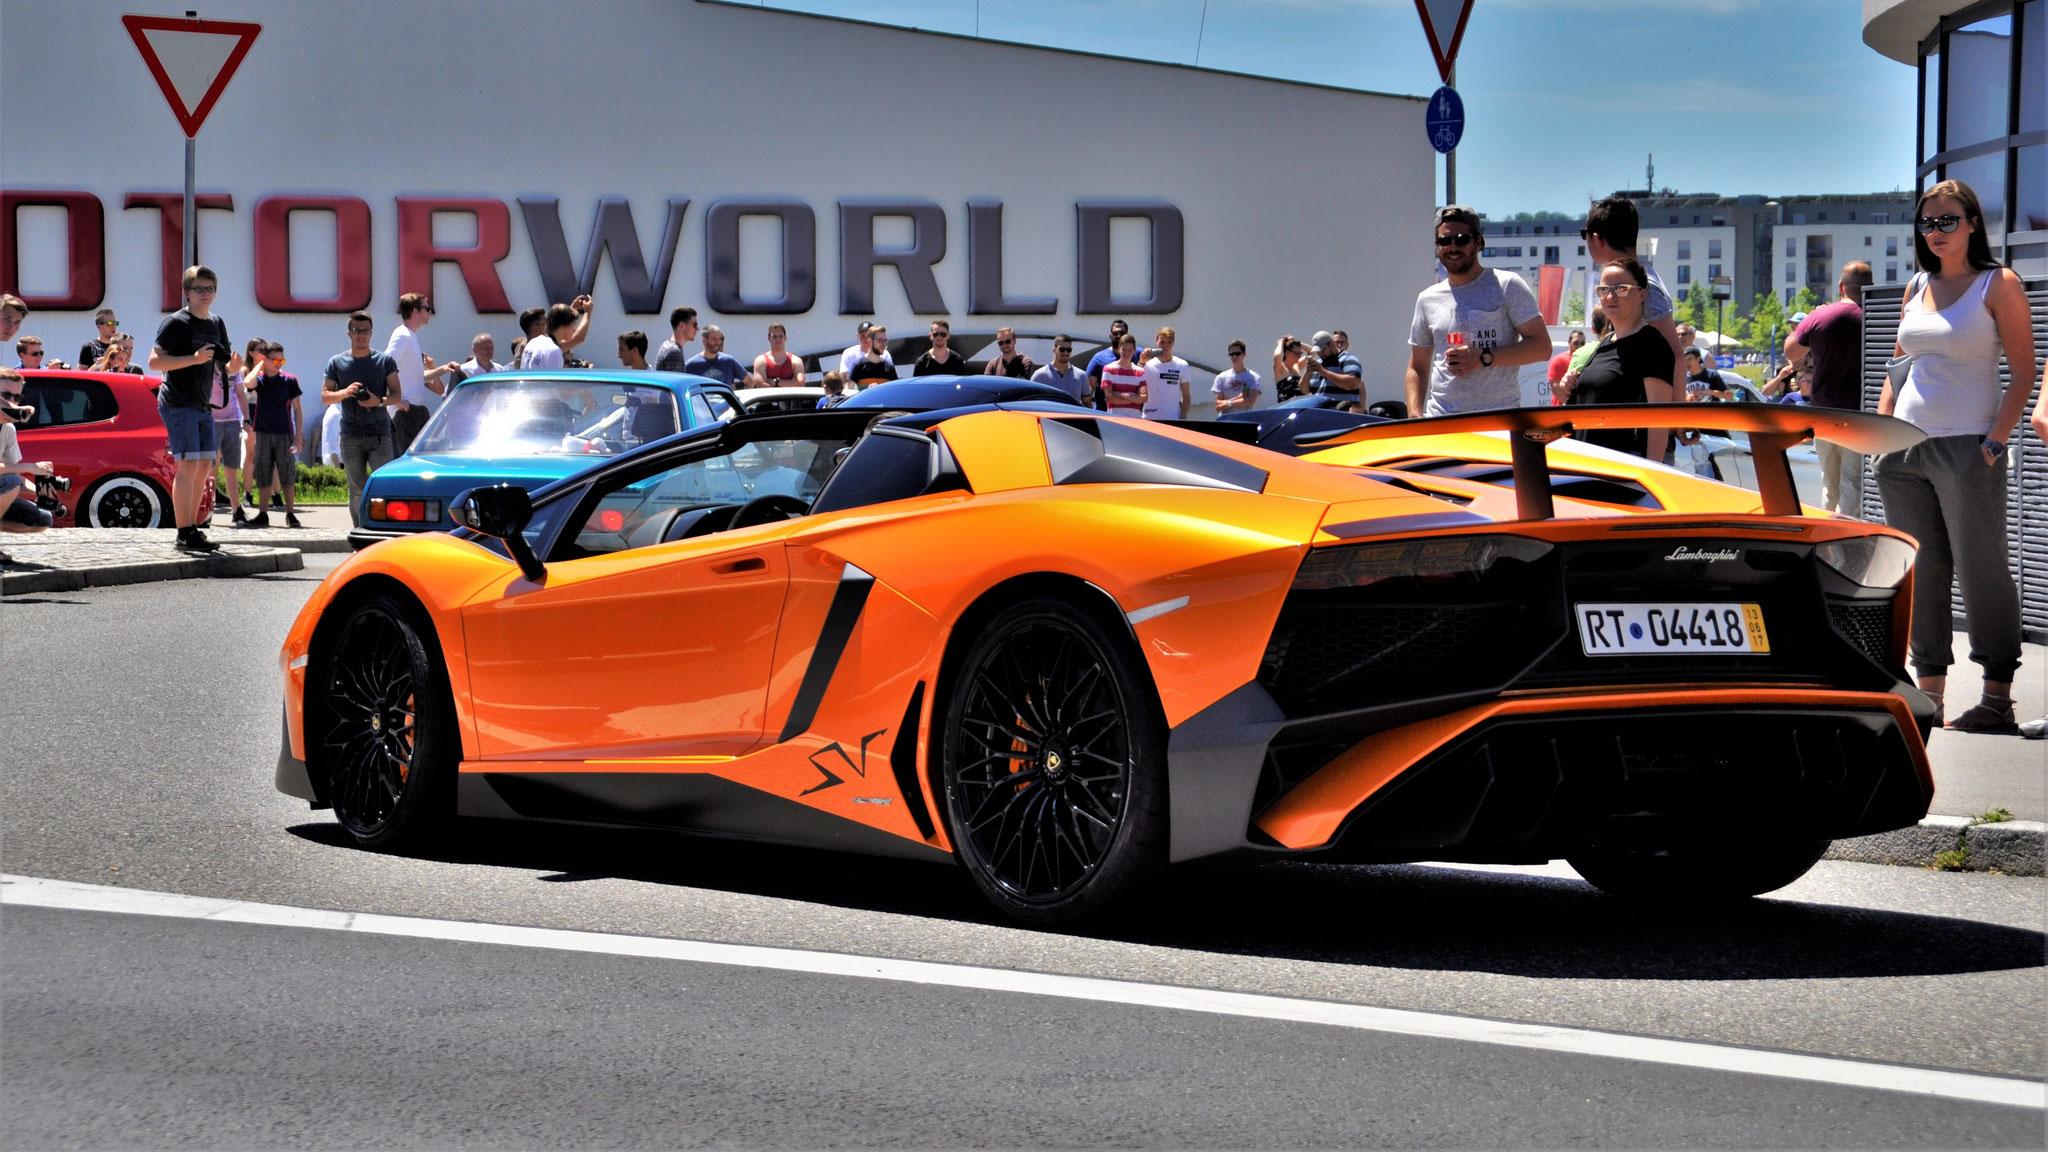 Lamborghini Aventador LP-750-4 SV Roadster - RT-04418